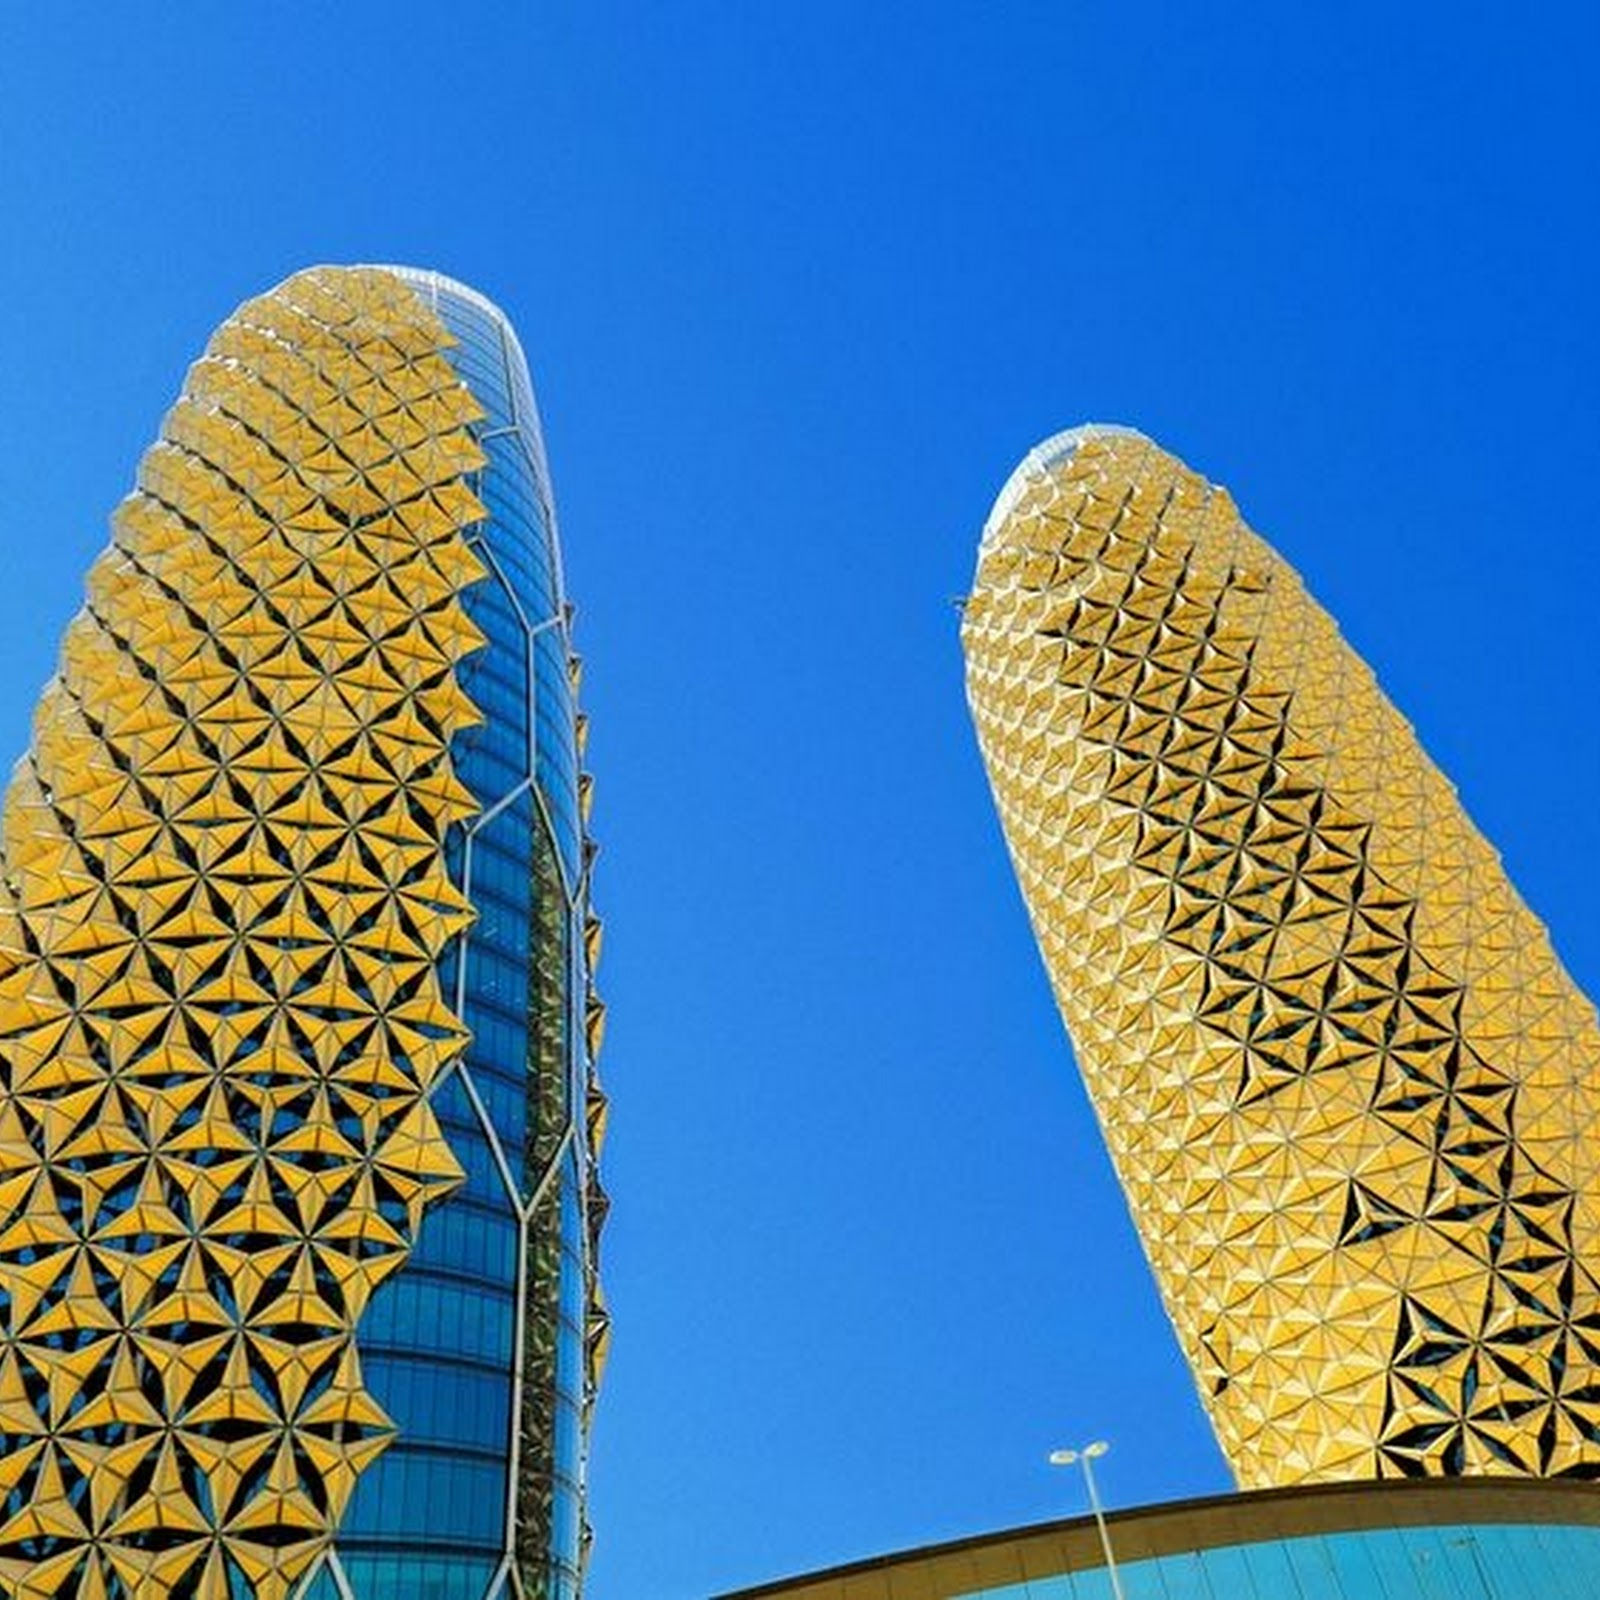 Al Bahar Towers' Responsive Sun Shades